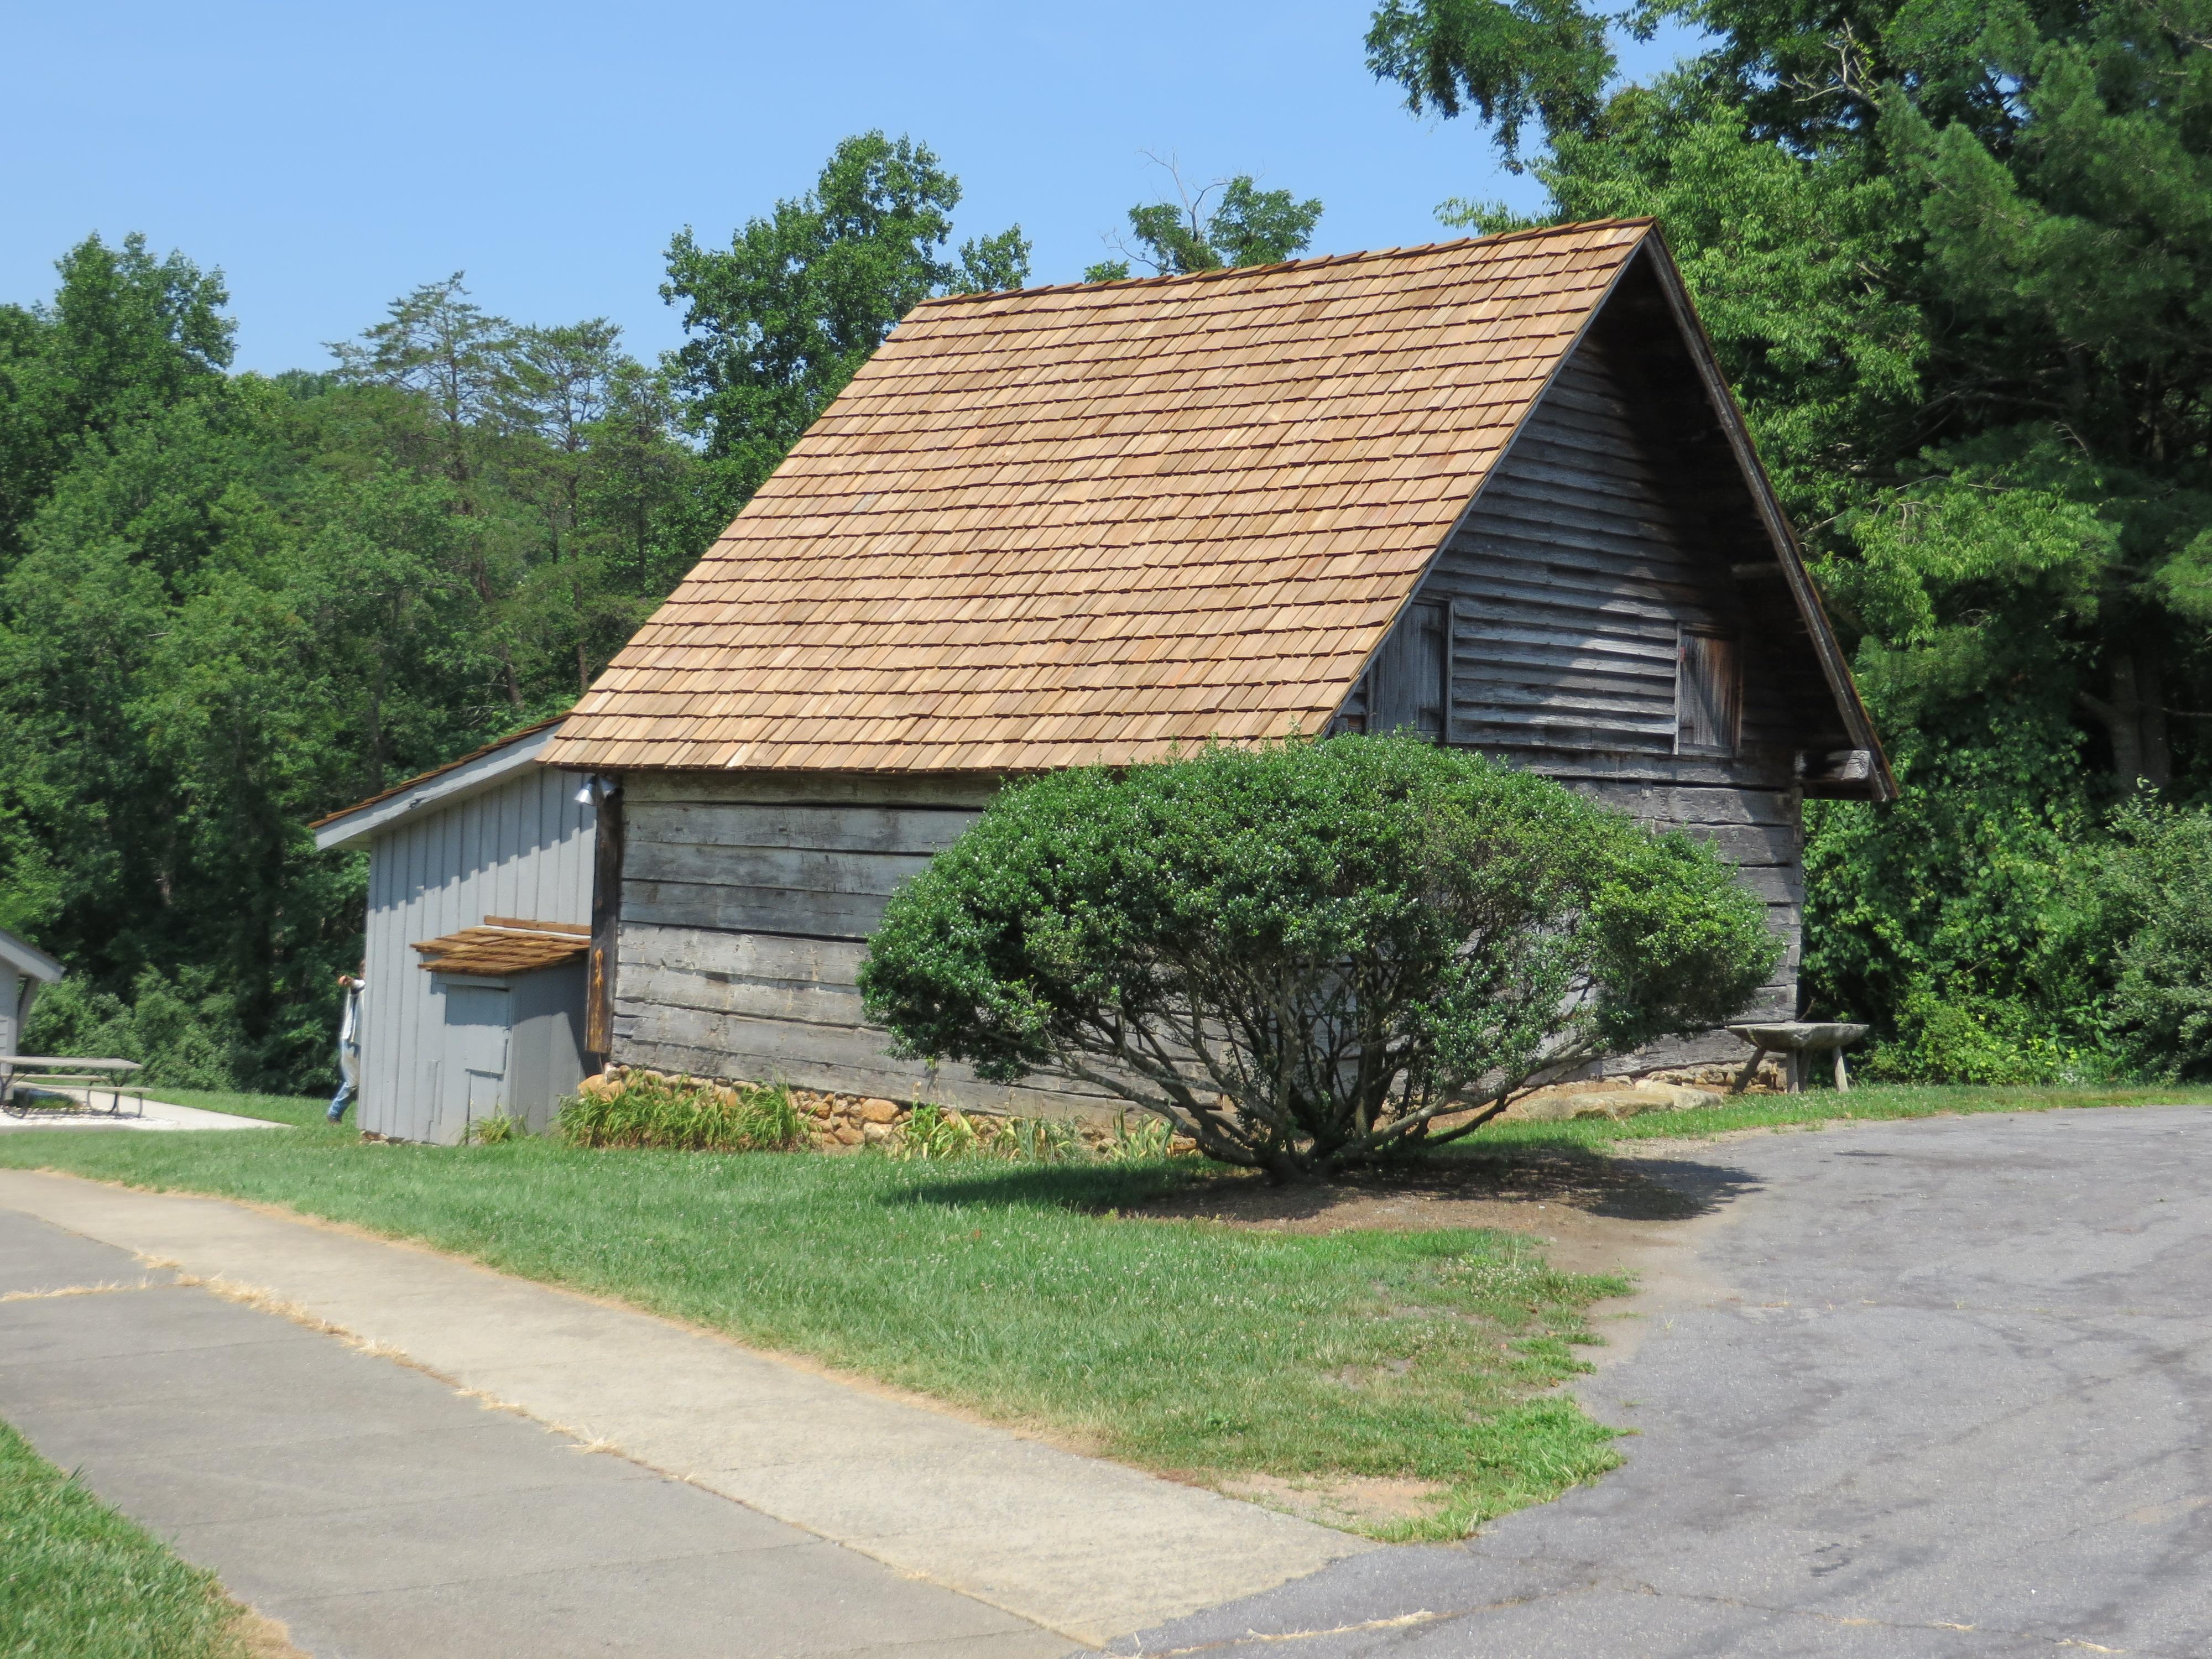 Reynolds Homestead Patrick County Virginia